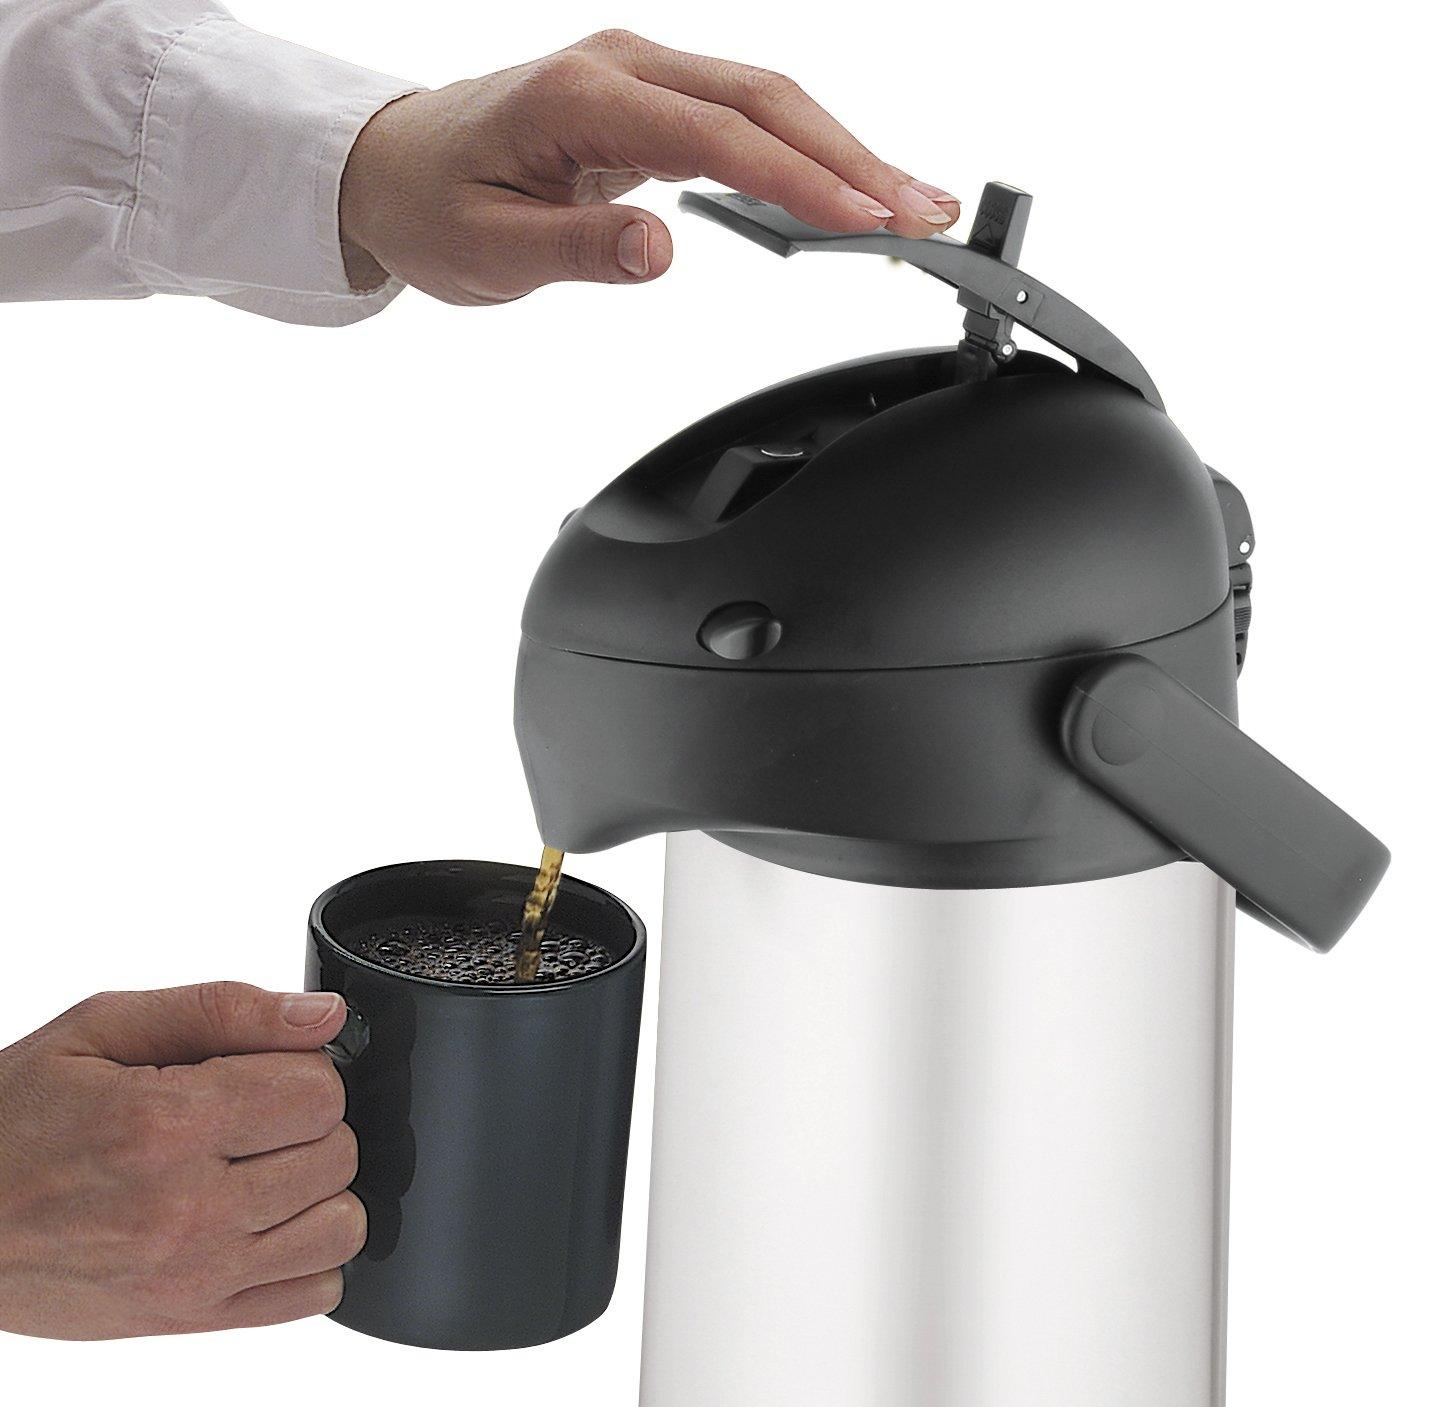 Thermos Lever Action Pump Pot, 2.5 L: Amazon.co.uk: Kitchen & Home